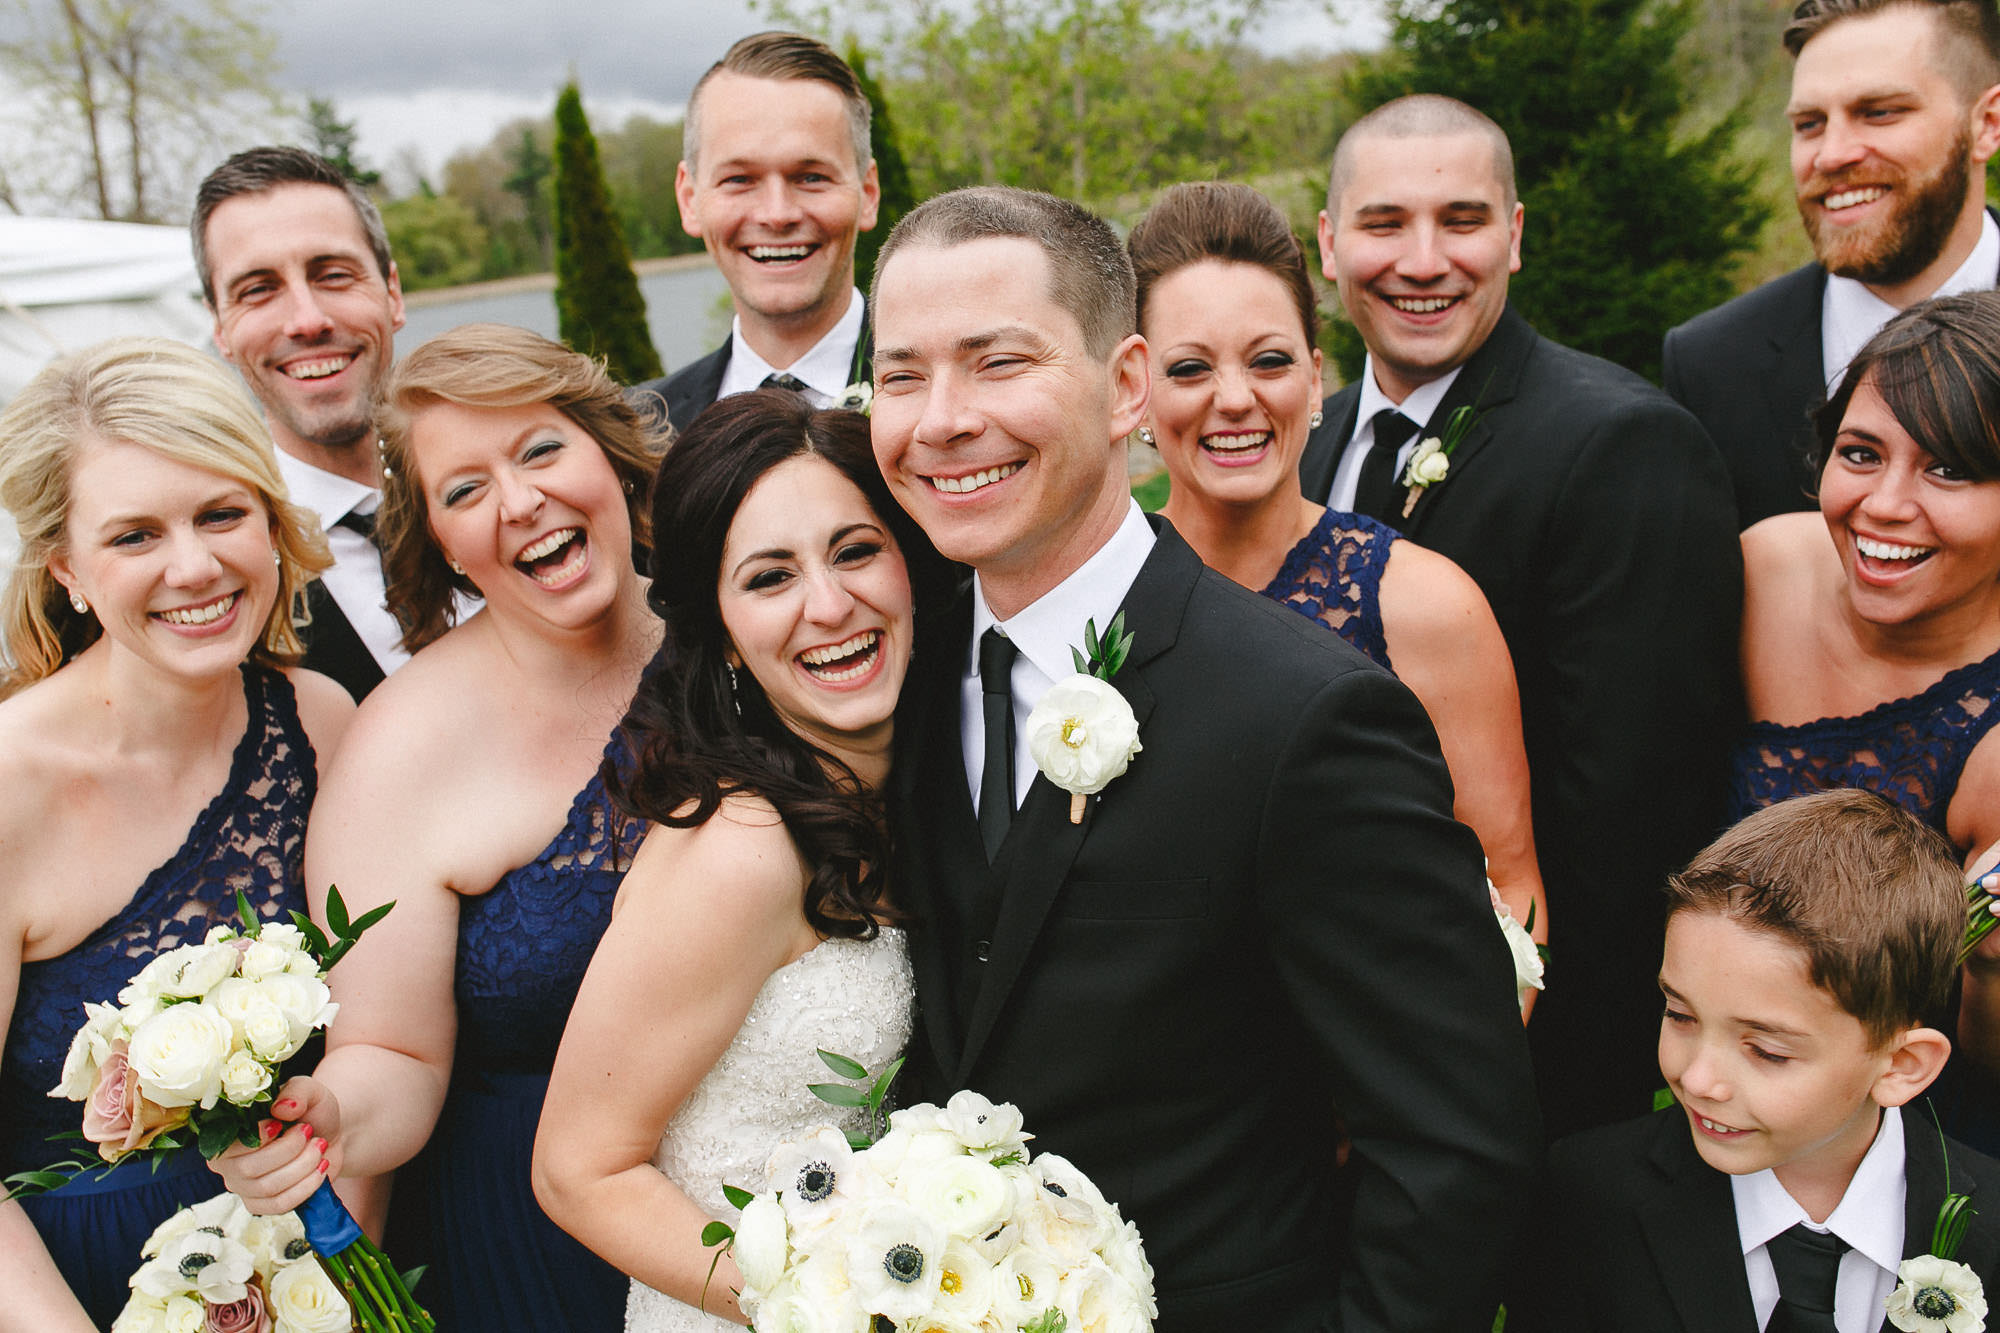 michigan-backyard-wedding051431.jpg